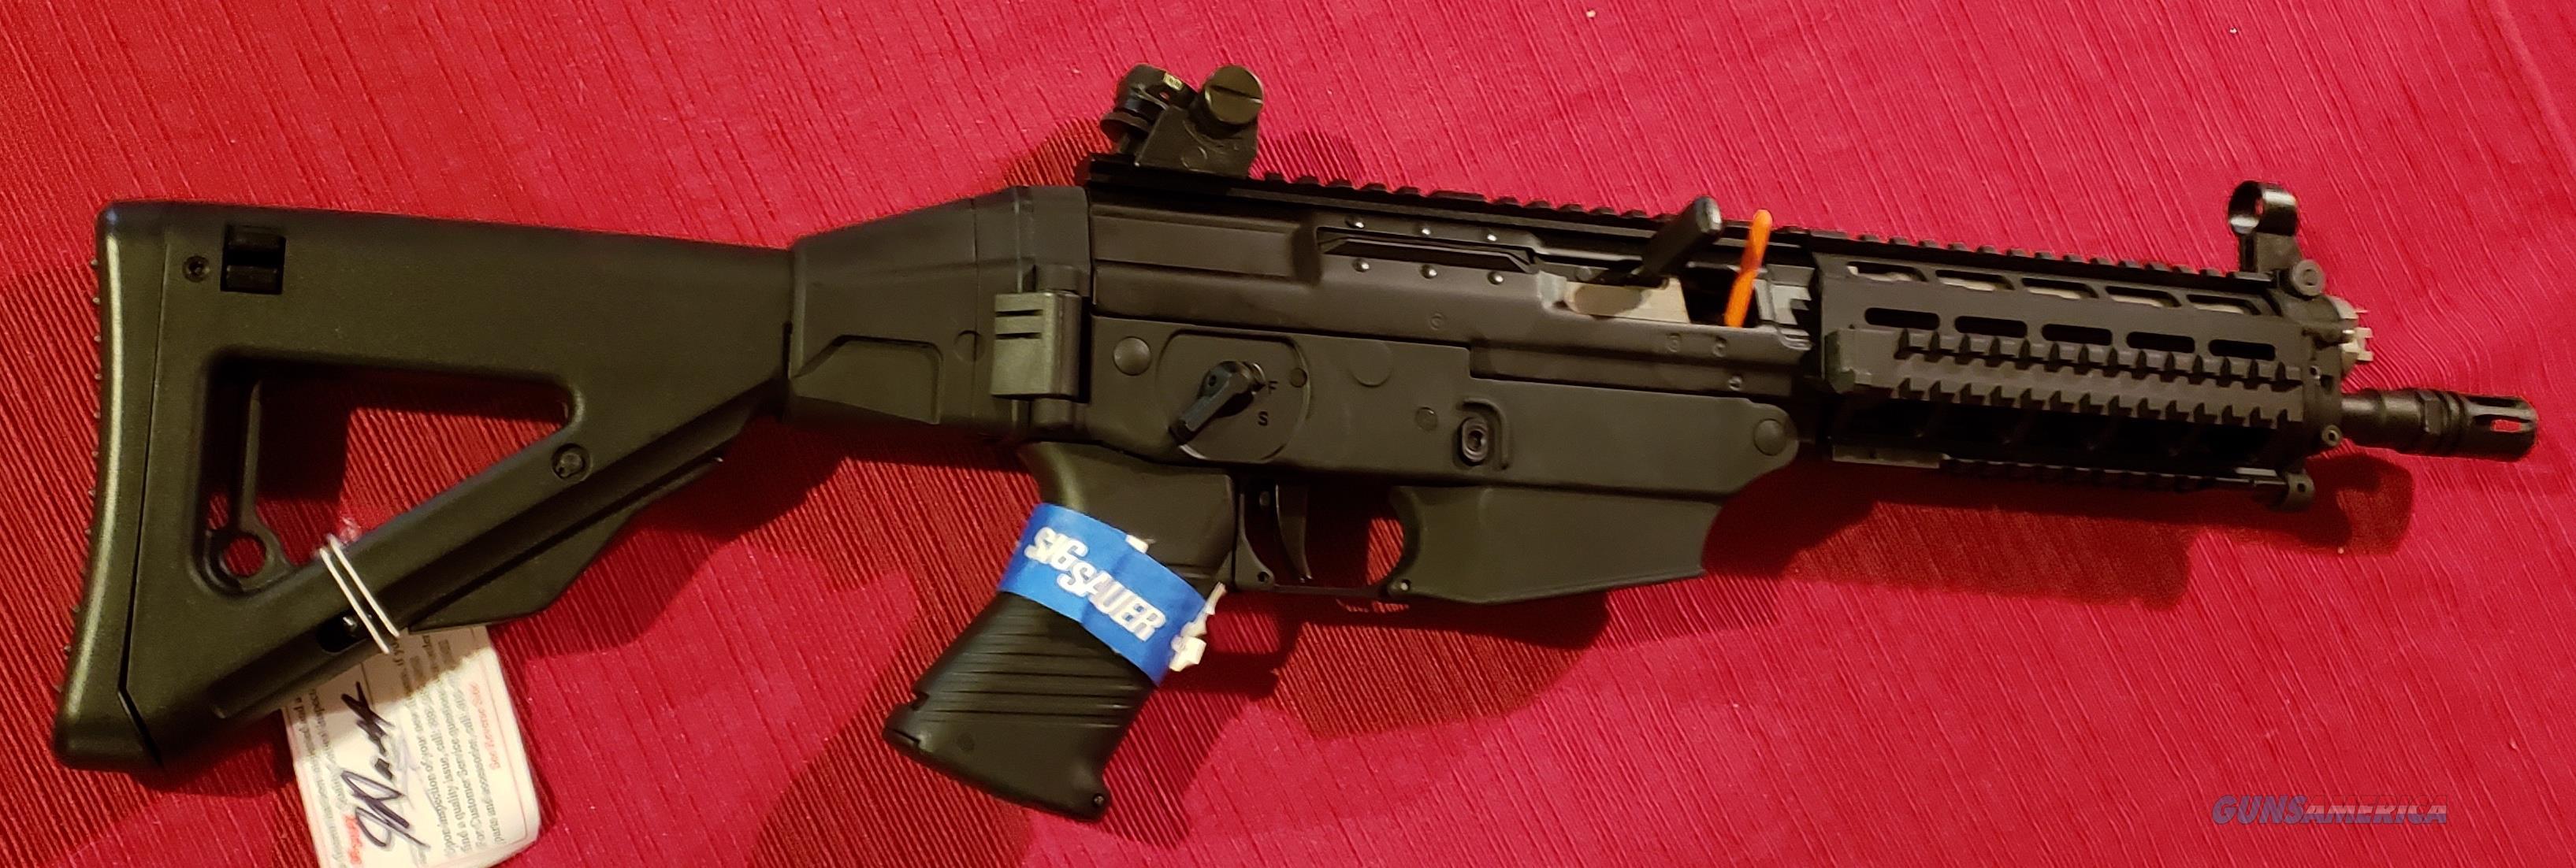 WTS Sig Sauer 556 SWAT SBR  Guns > Rifles > Sig - Sauer/Sigarms Rifles